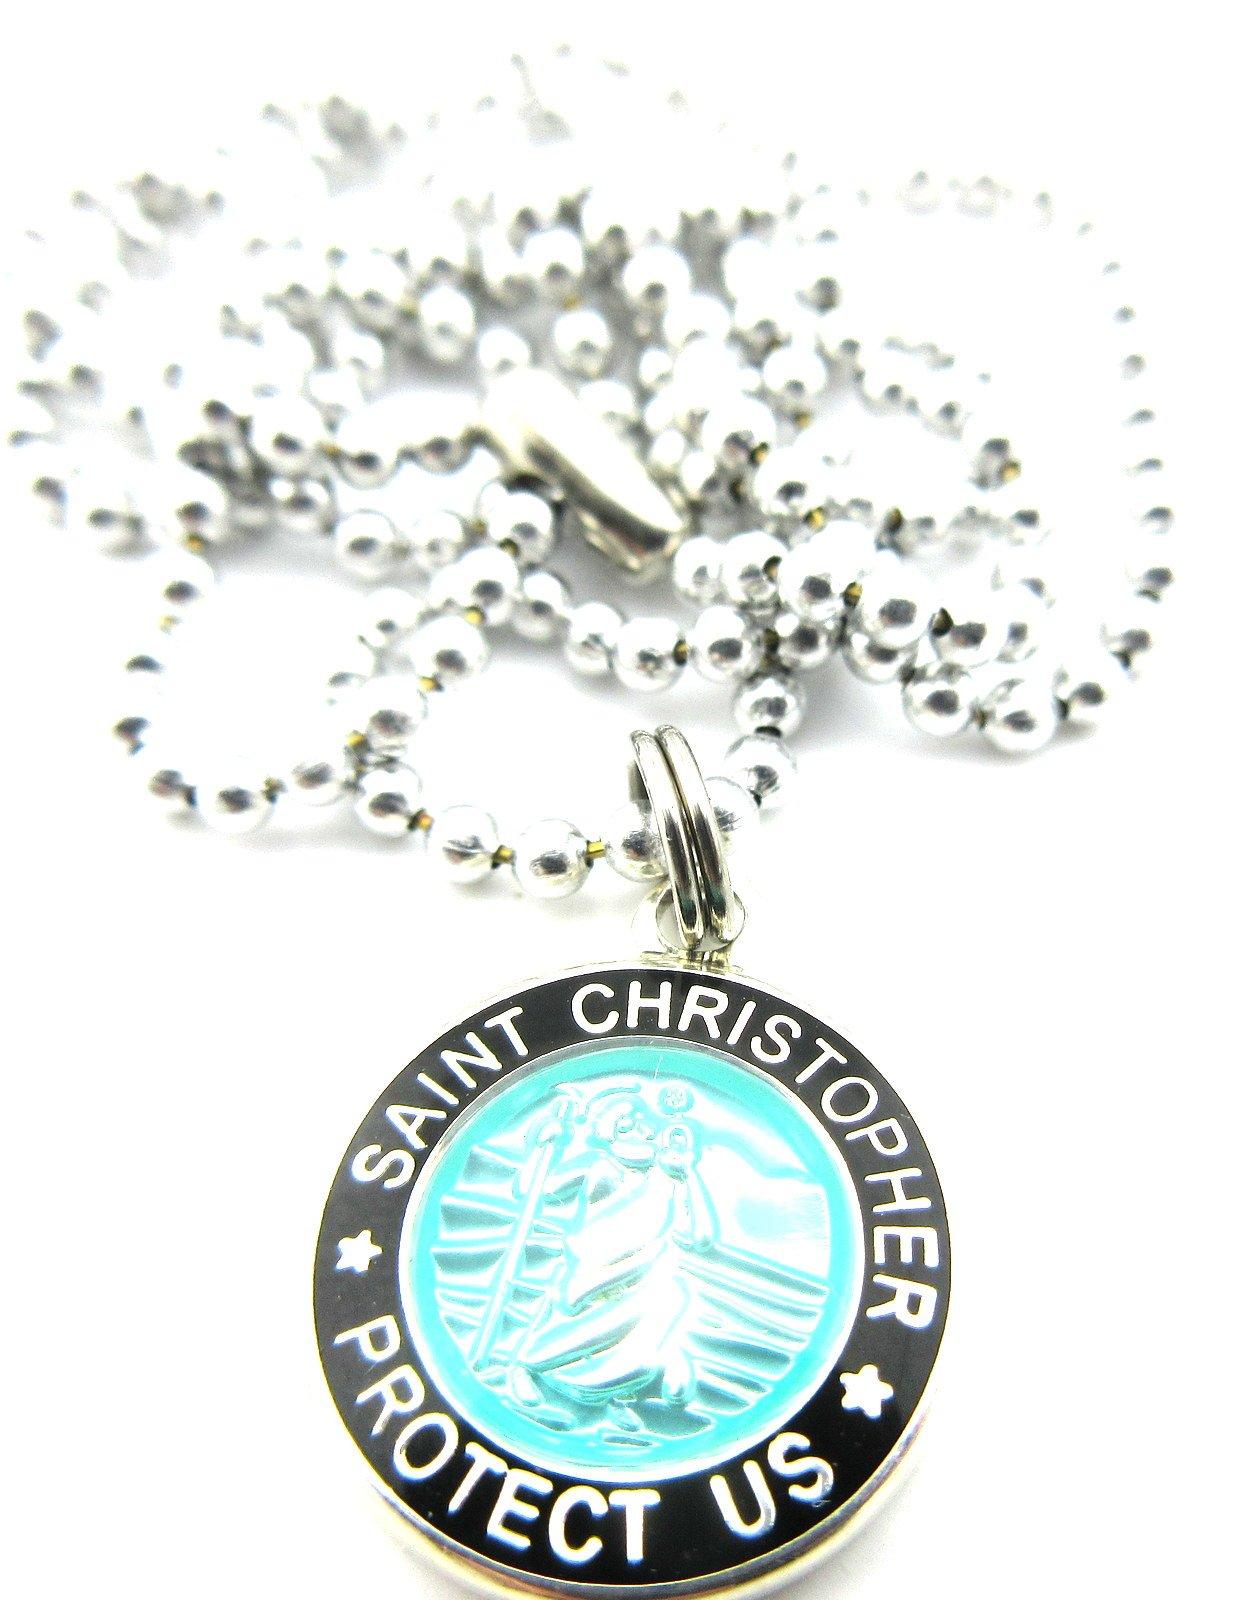 Mini St Christopher Surf Medal Pendant Necklace,Aquamarine/Black AQ/BK by Get Back Supply Co (Image #5)